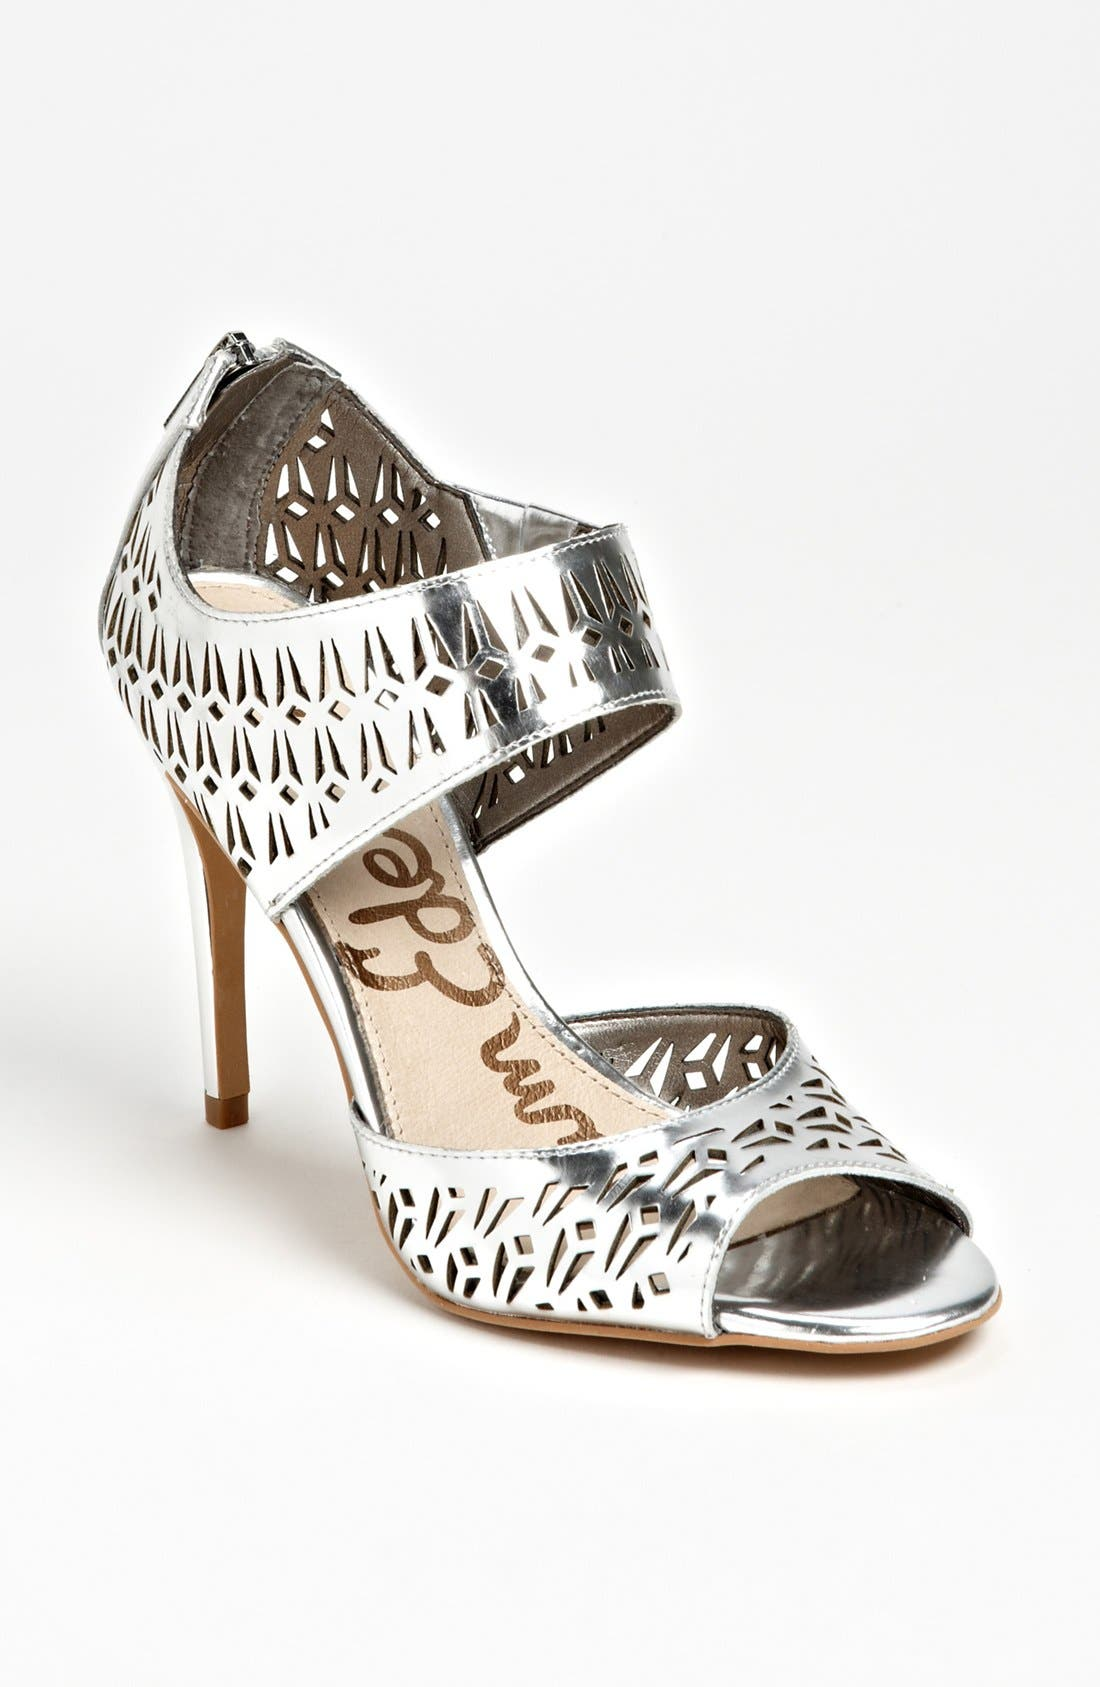 Alternate Image 1 Selected - Sam Edelman 'Alva' Sandal